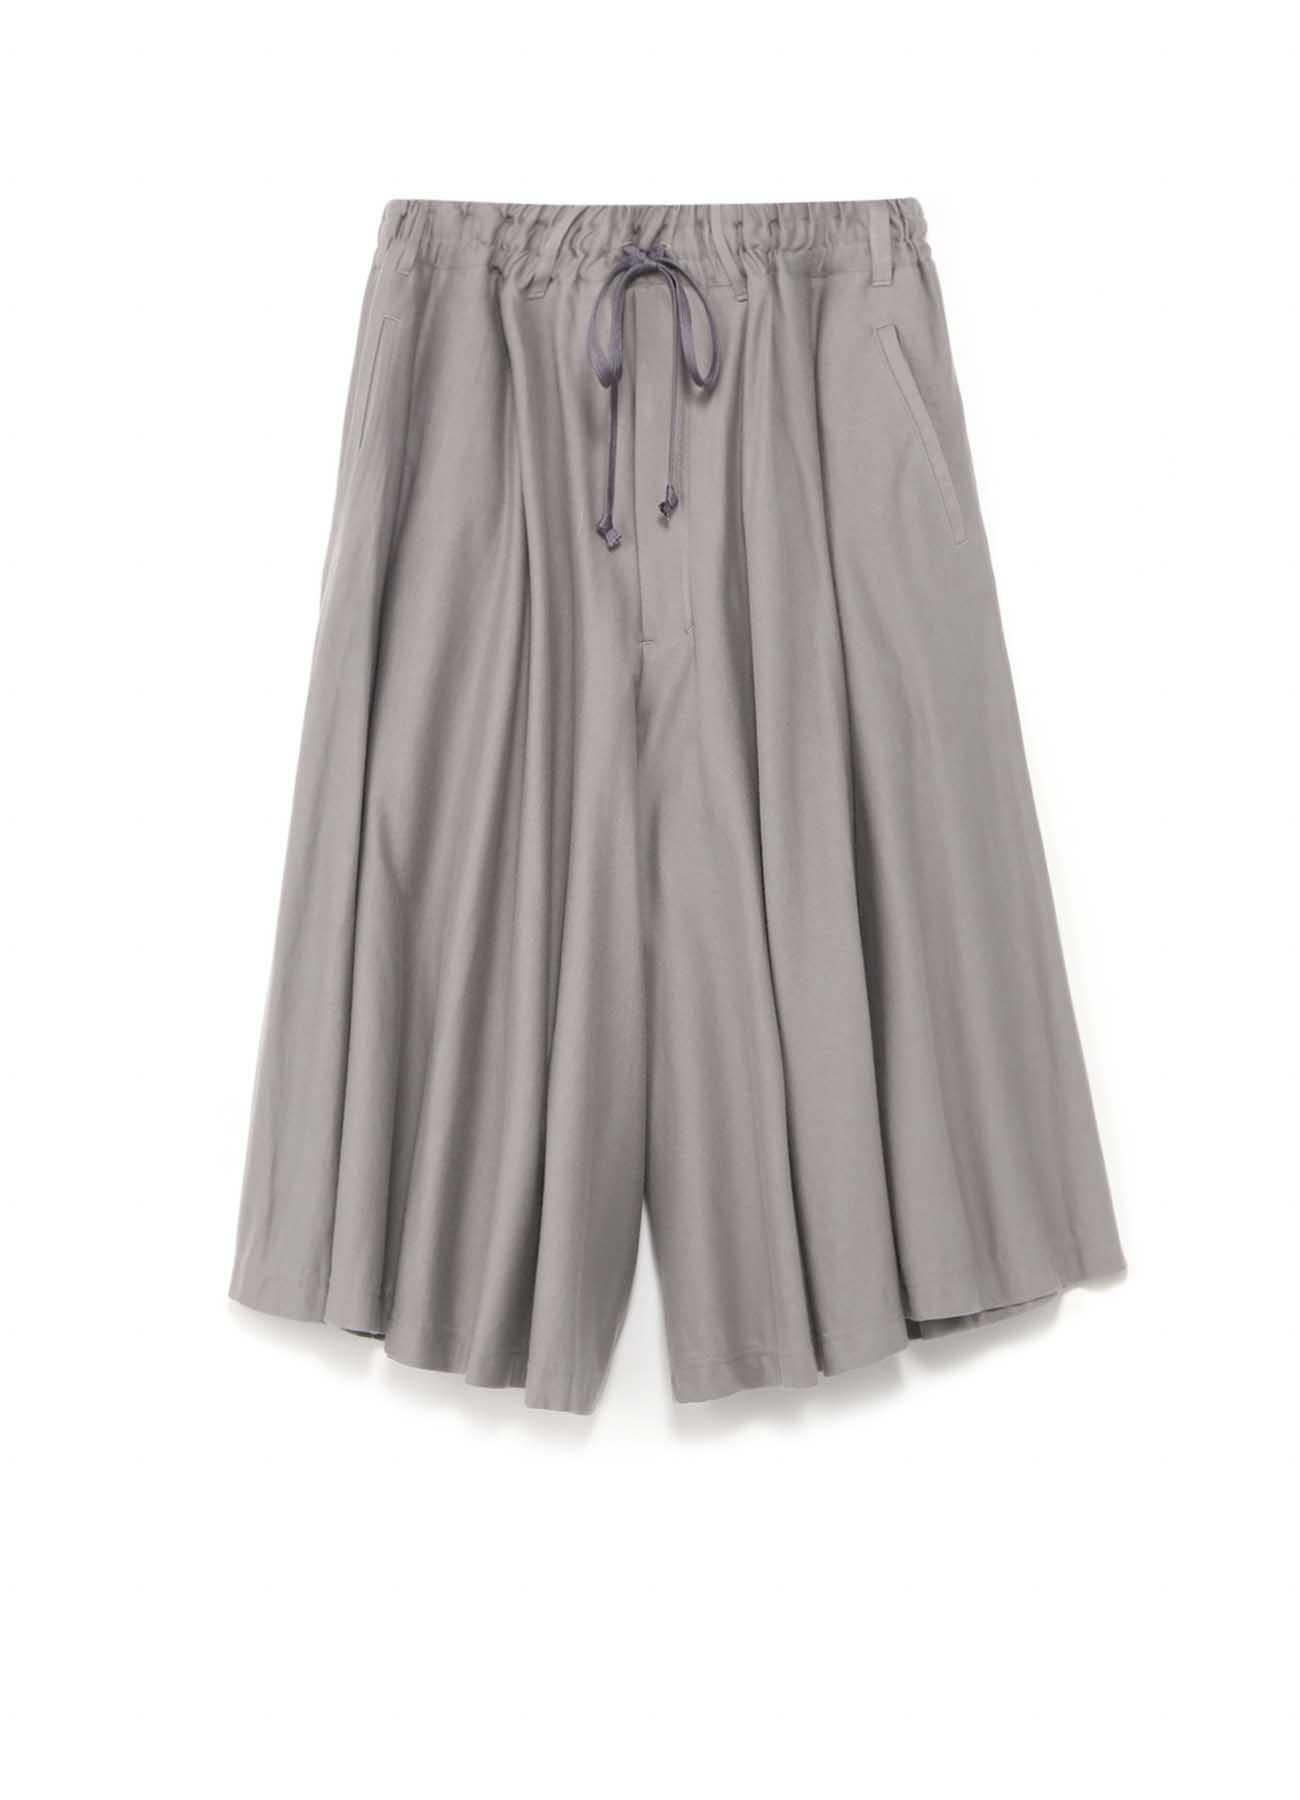 40 / Jersey?裤子